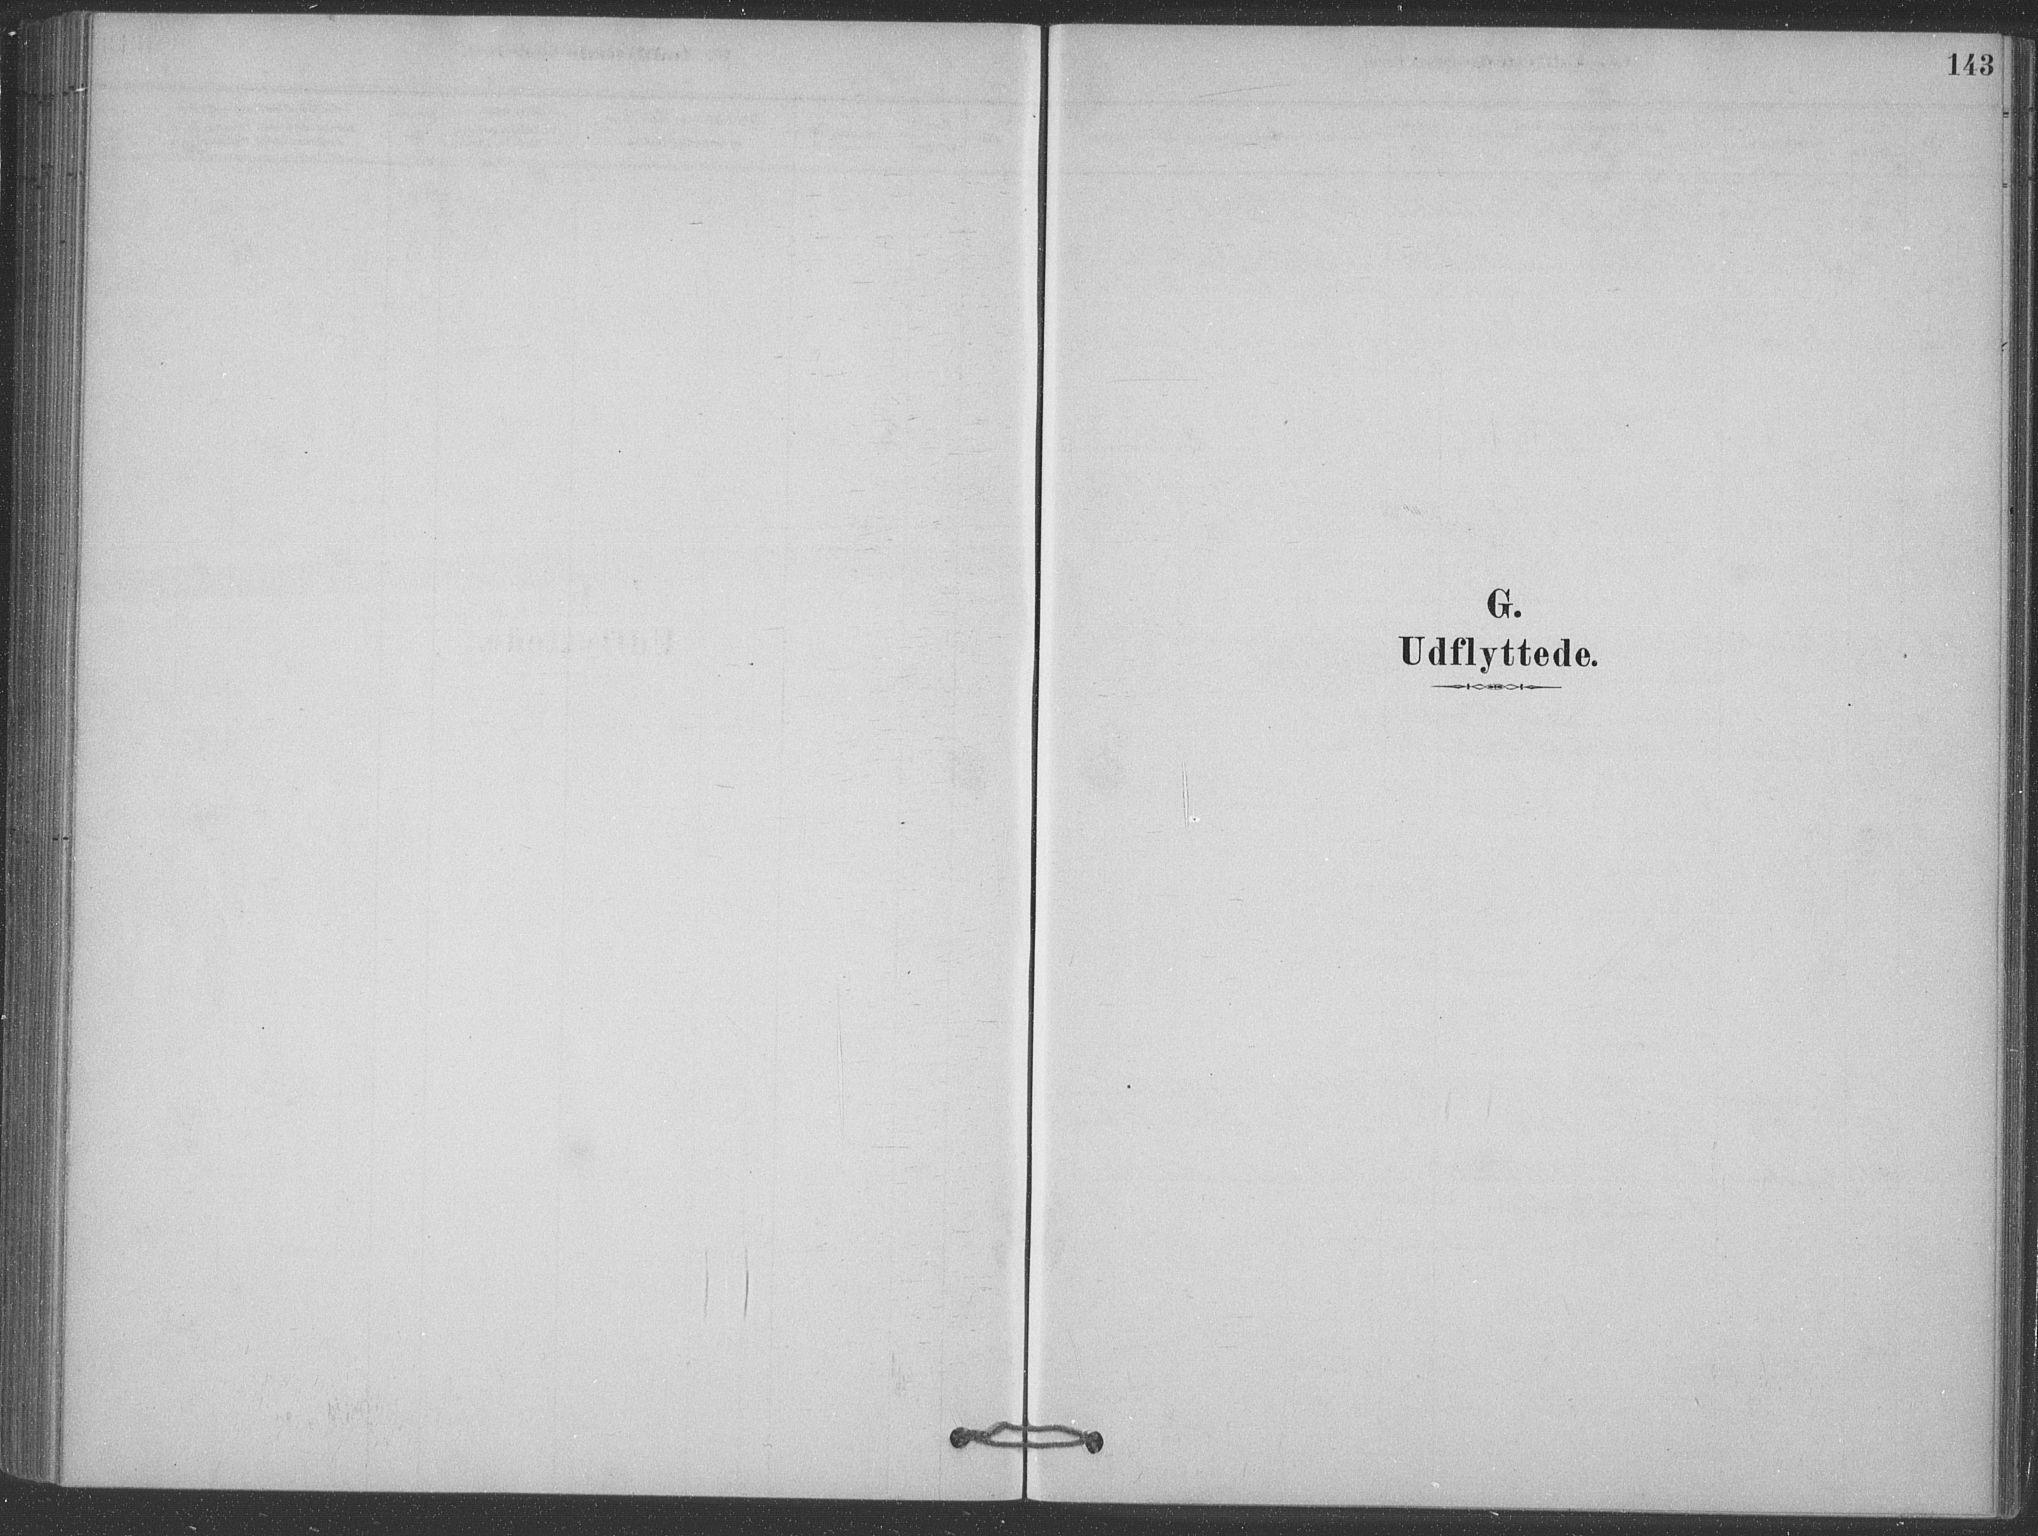 SAKO, Heddal kirkebøker, F/Fb/L0002: Ministerialbok nr. II 2, 1878-1913, s. 143